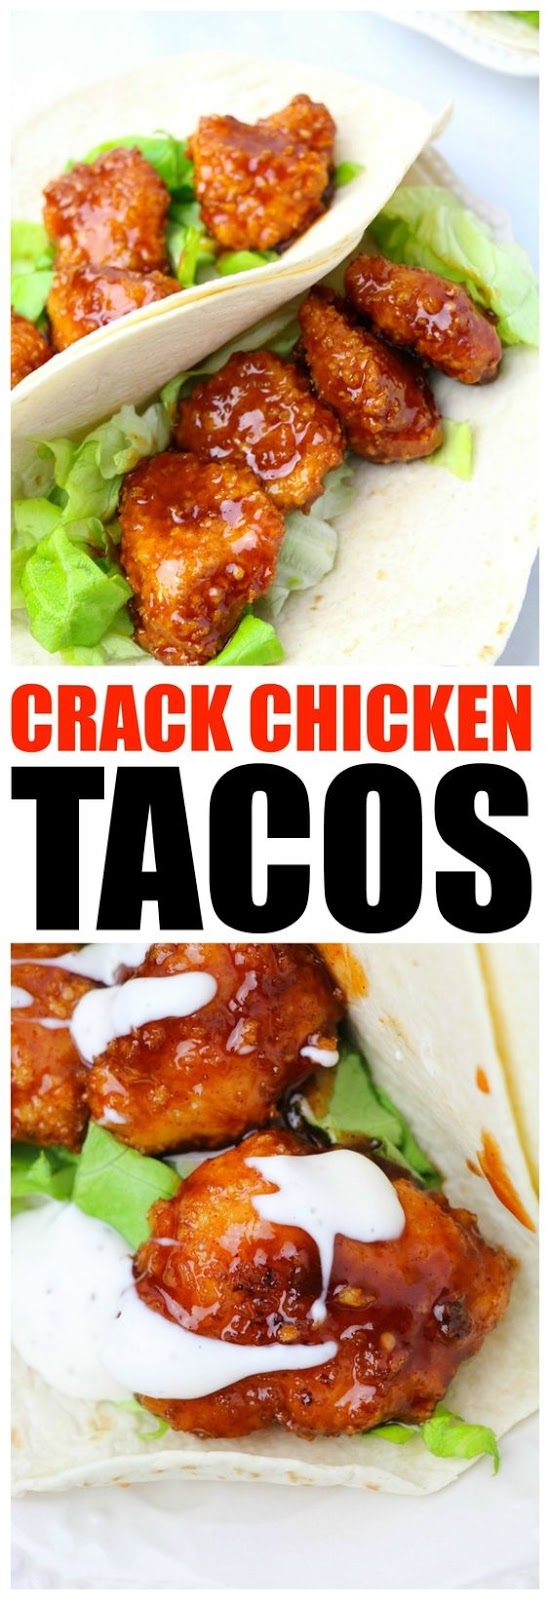 Crack Chicken Tacos